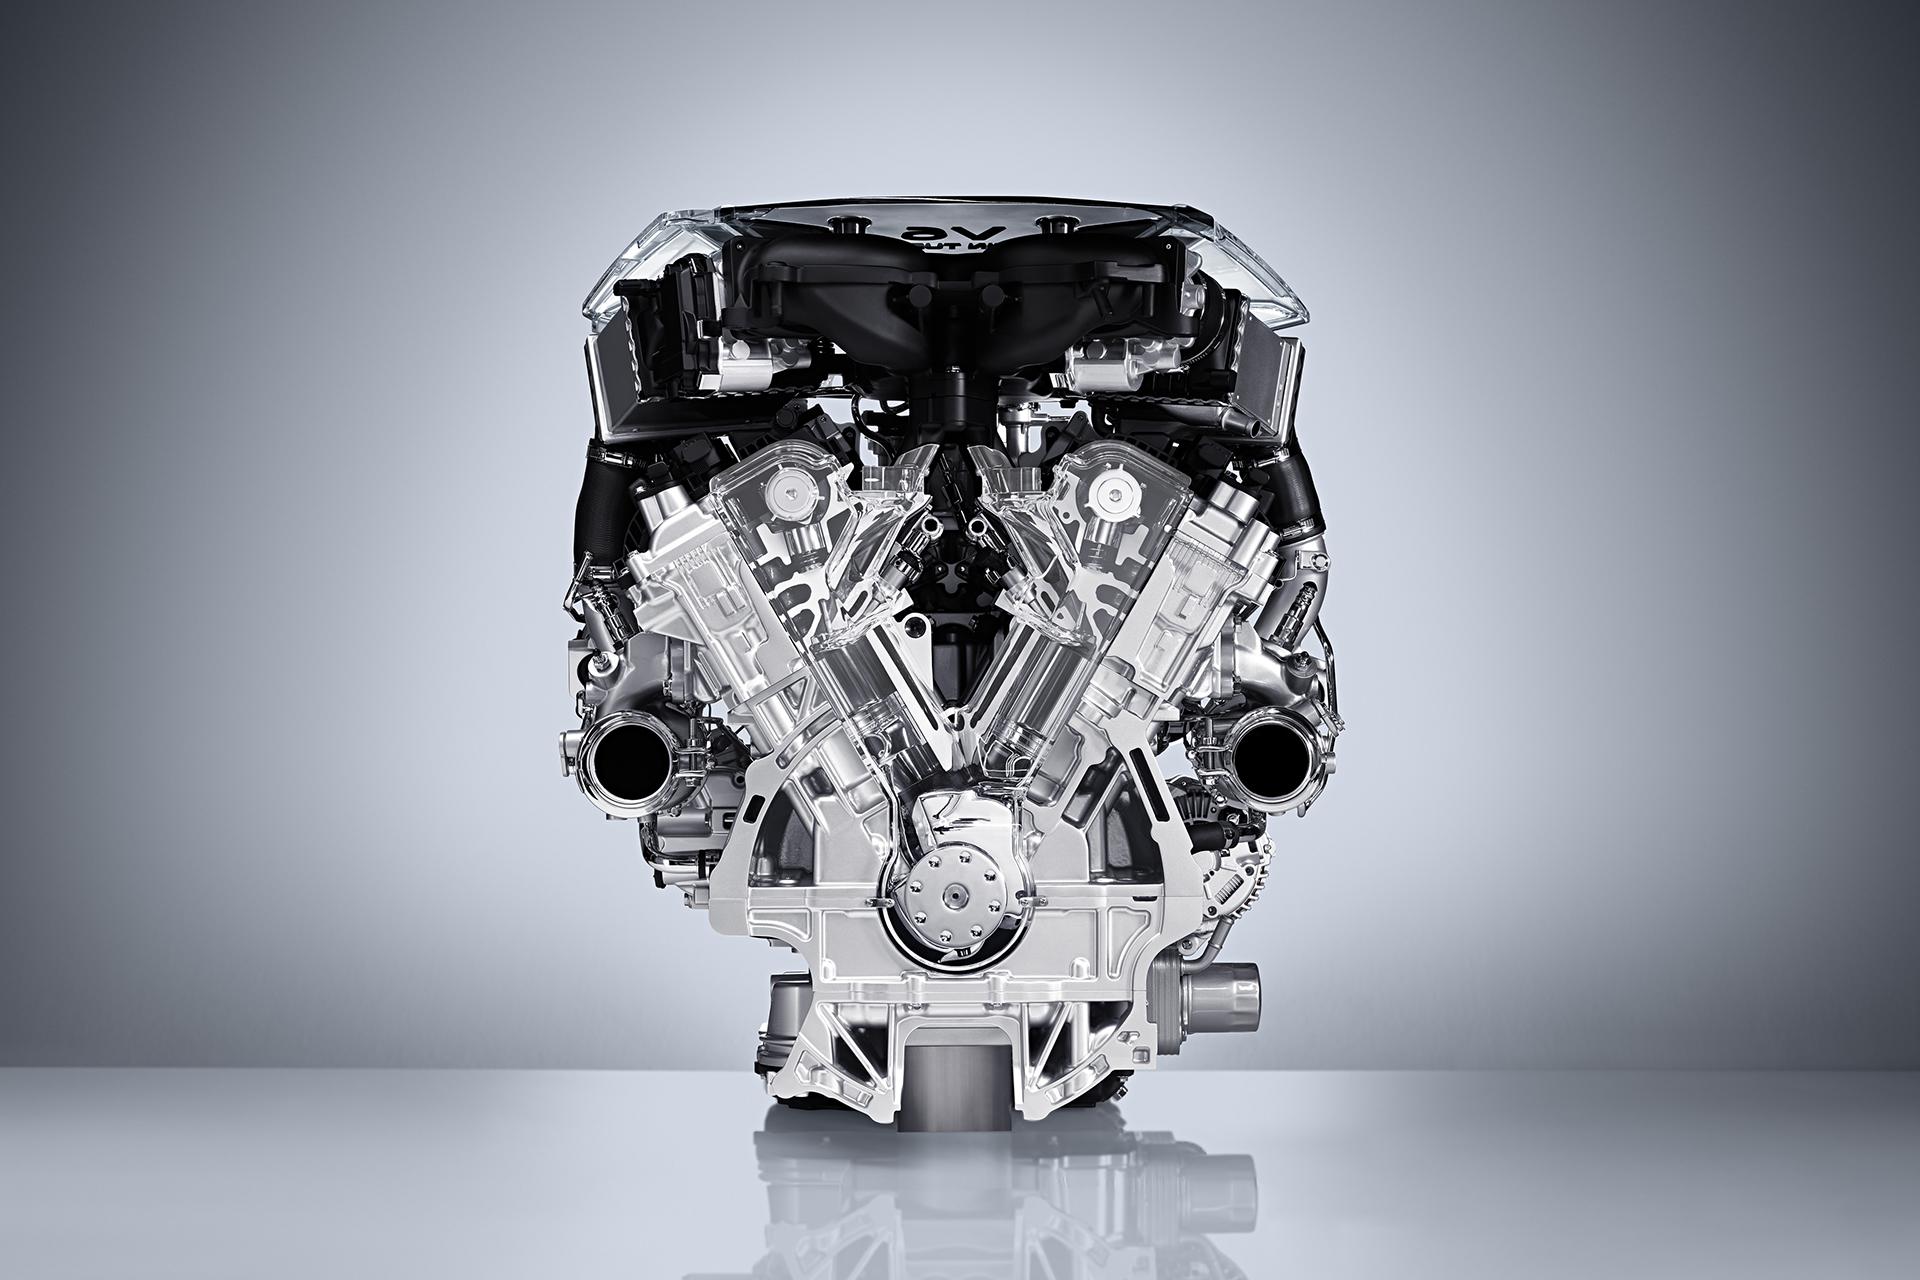 INFINITI 3.0-Liter twin-turbo V6 двигатель